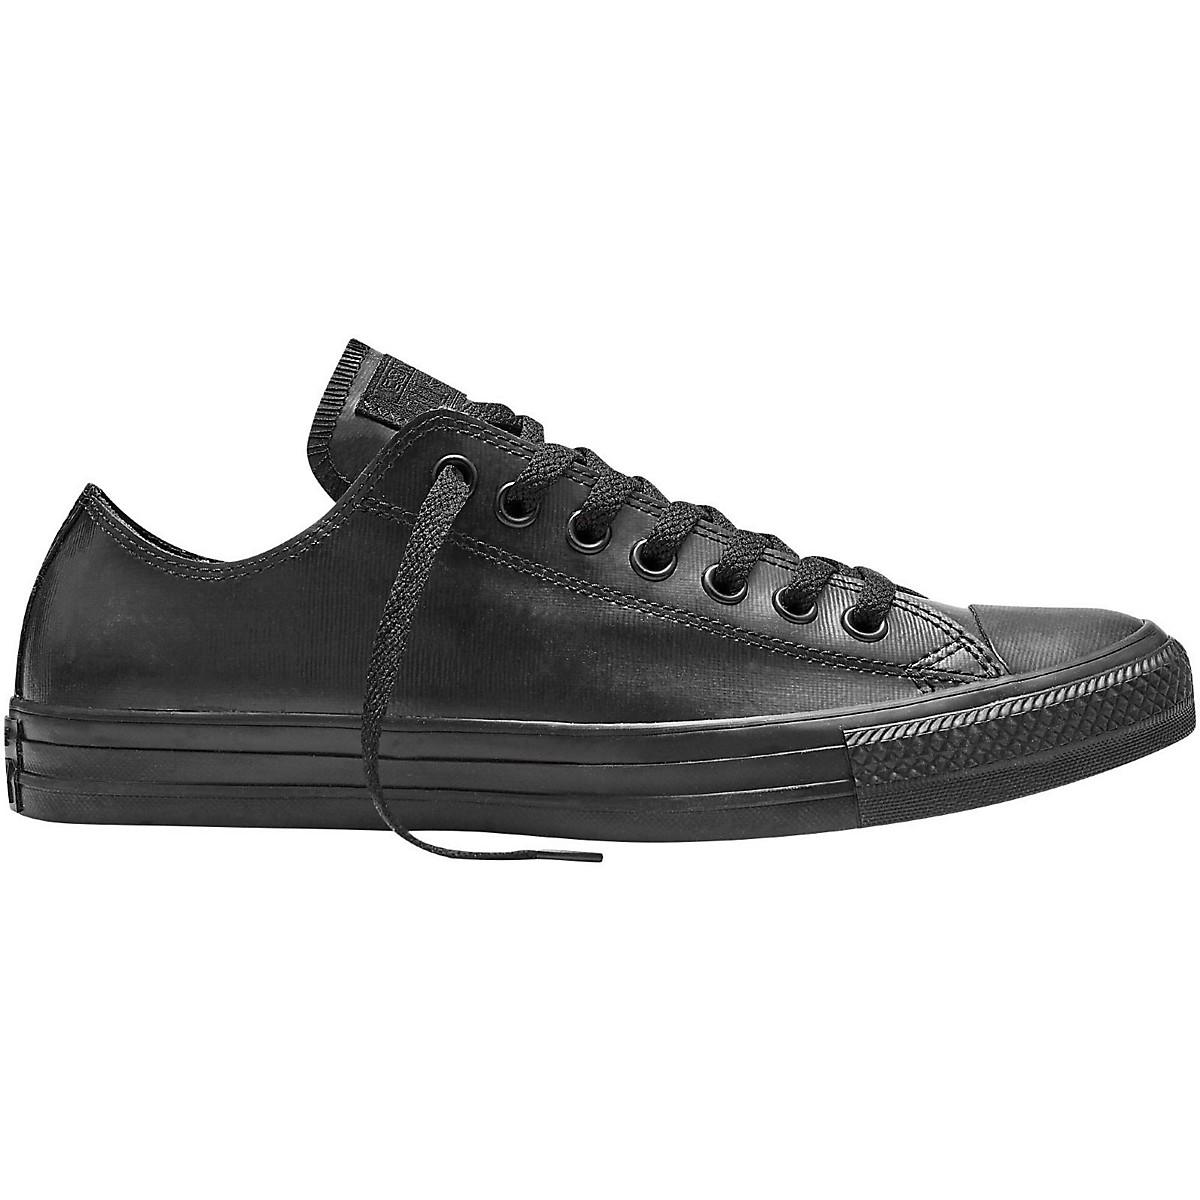 Converse All Star Rubber Black/Black/Black (Men's) Regular